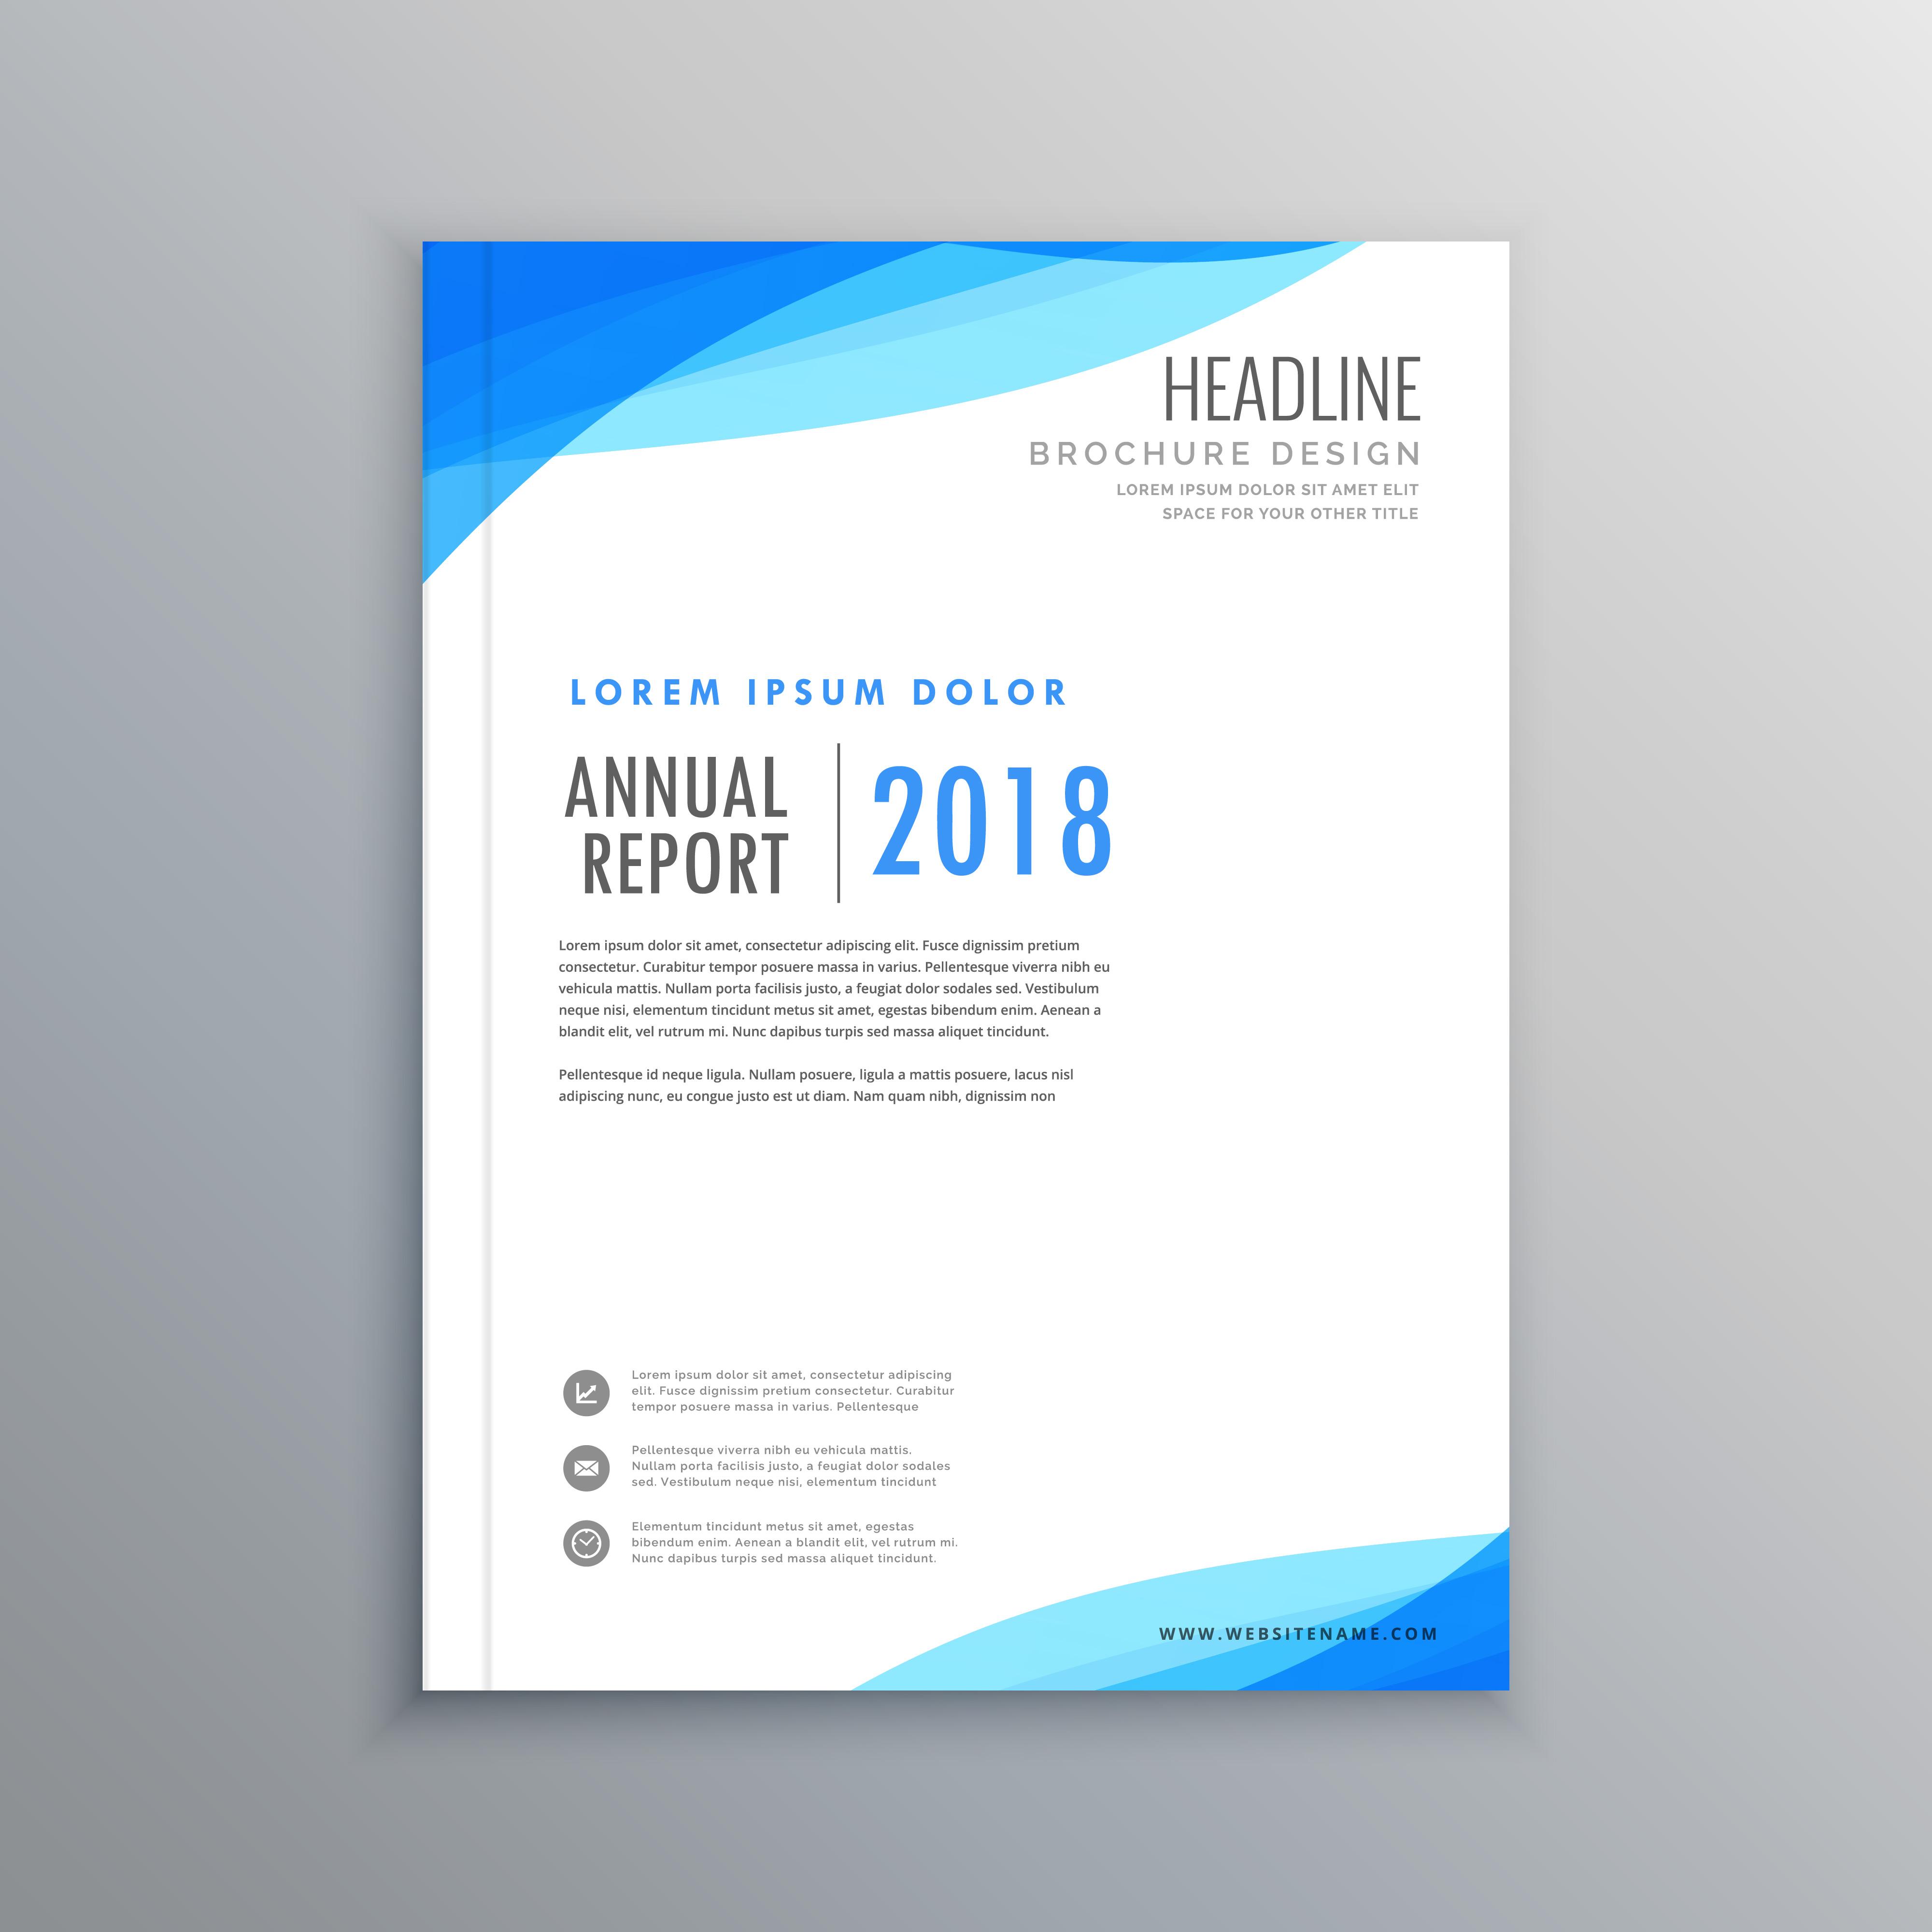 Elegant Blue Wave Business Brochure Template Download Free Vector